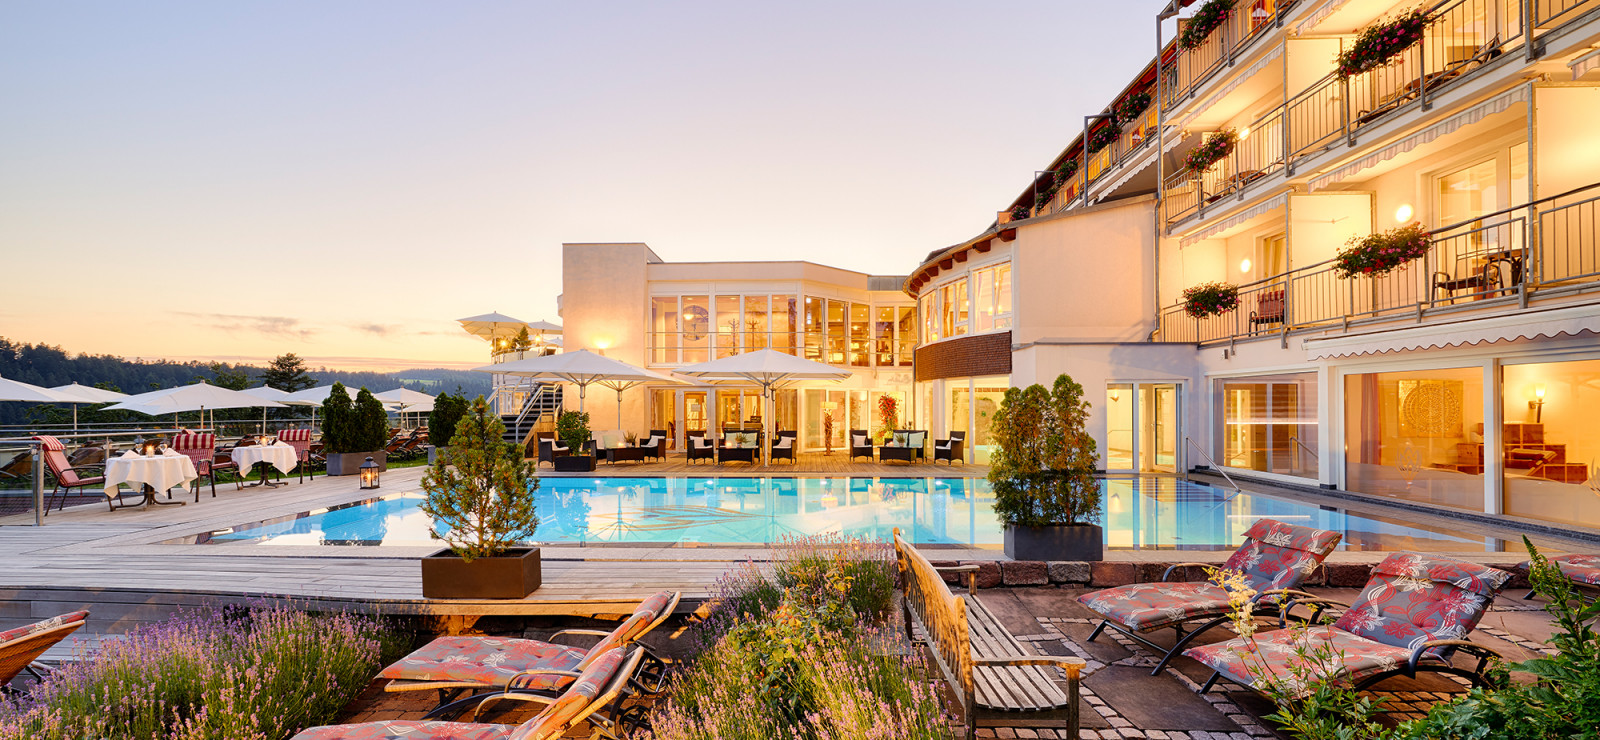 Hotel Berlin´s Krone Lamm Bilder | Bild 1